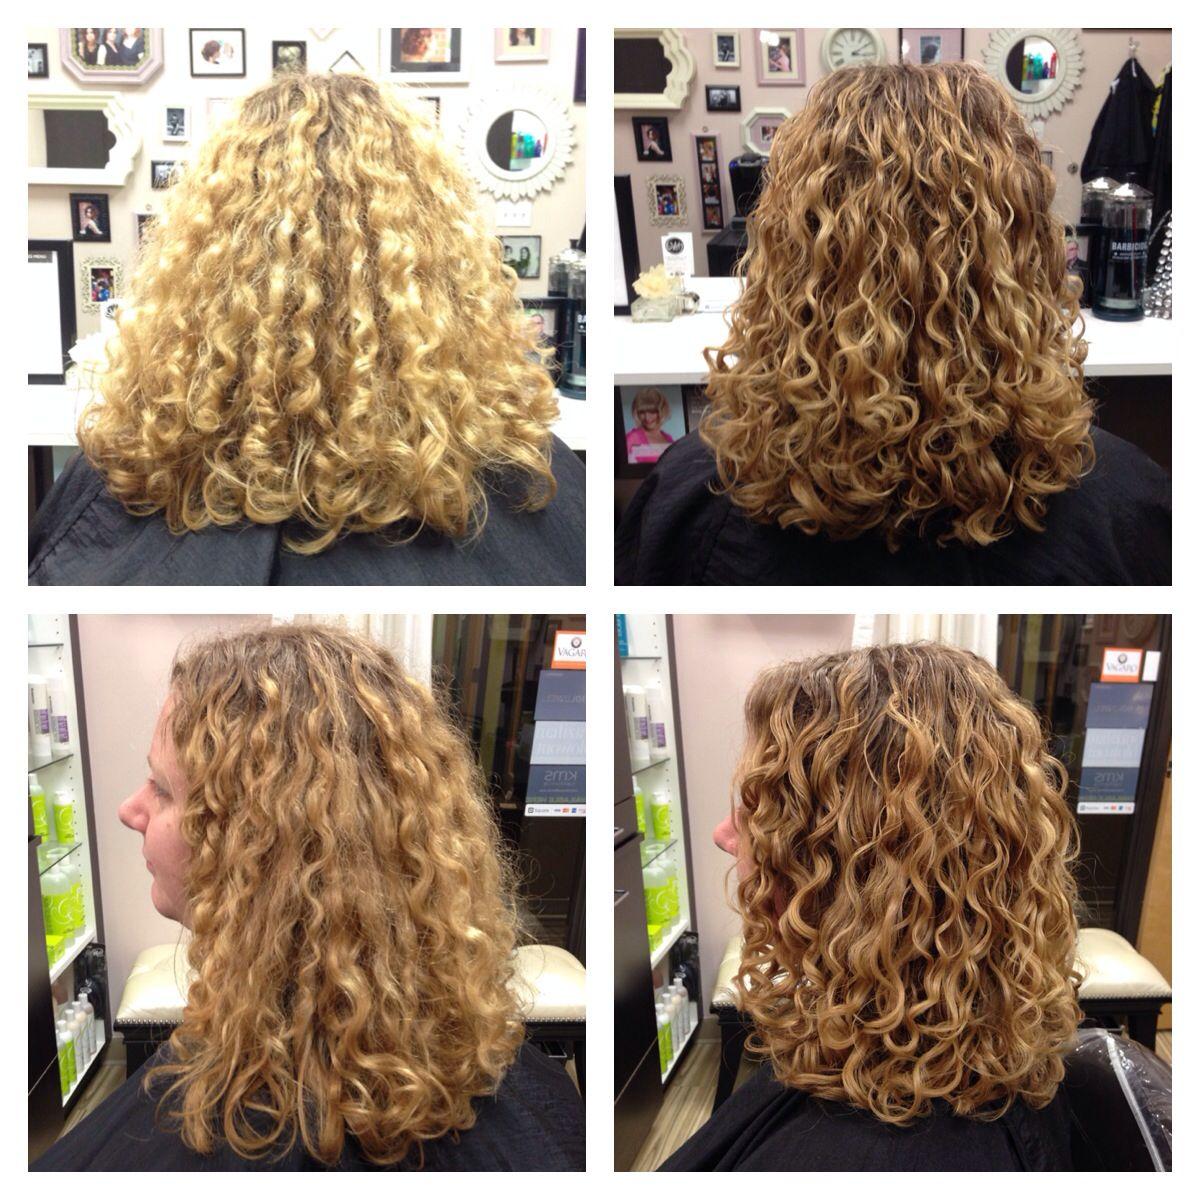 Pin By Danielle Skrocki On My Salon Stylist317 Curly Hair Styles Naturally Long Hair Styles Hair Styles